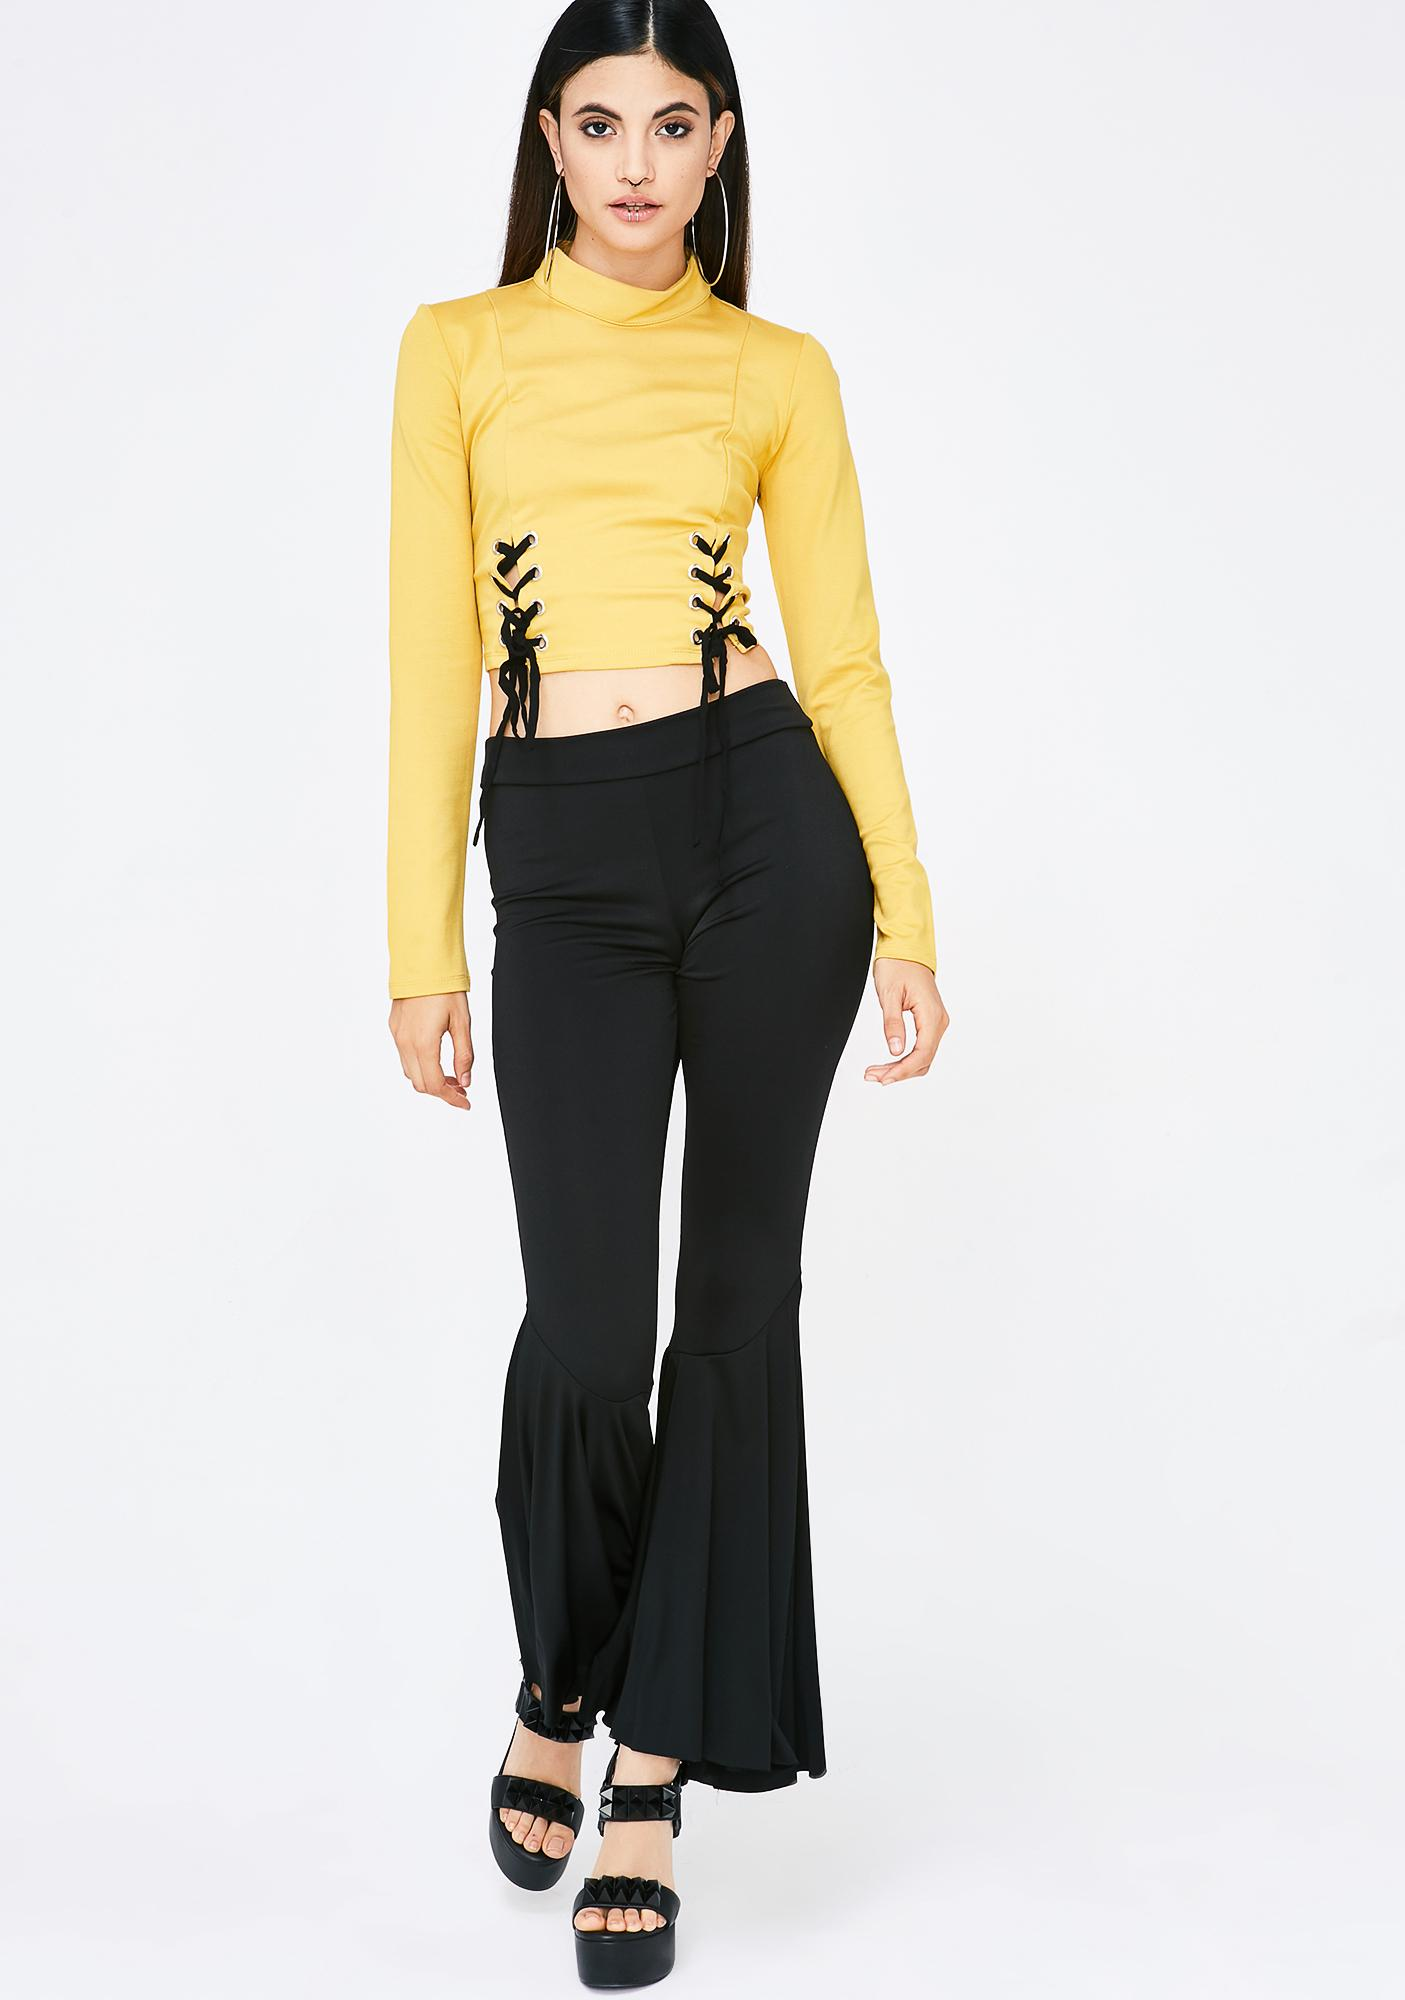 Queen Bee Lace-Up Top